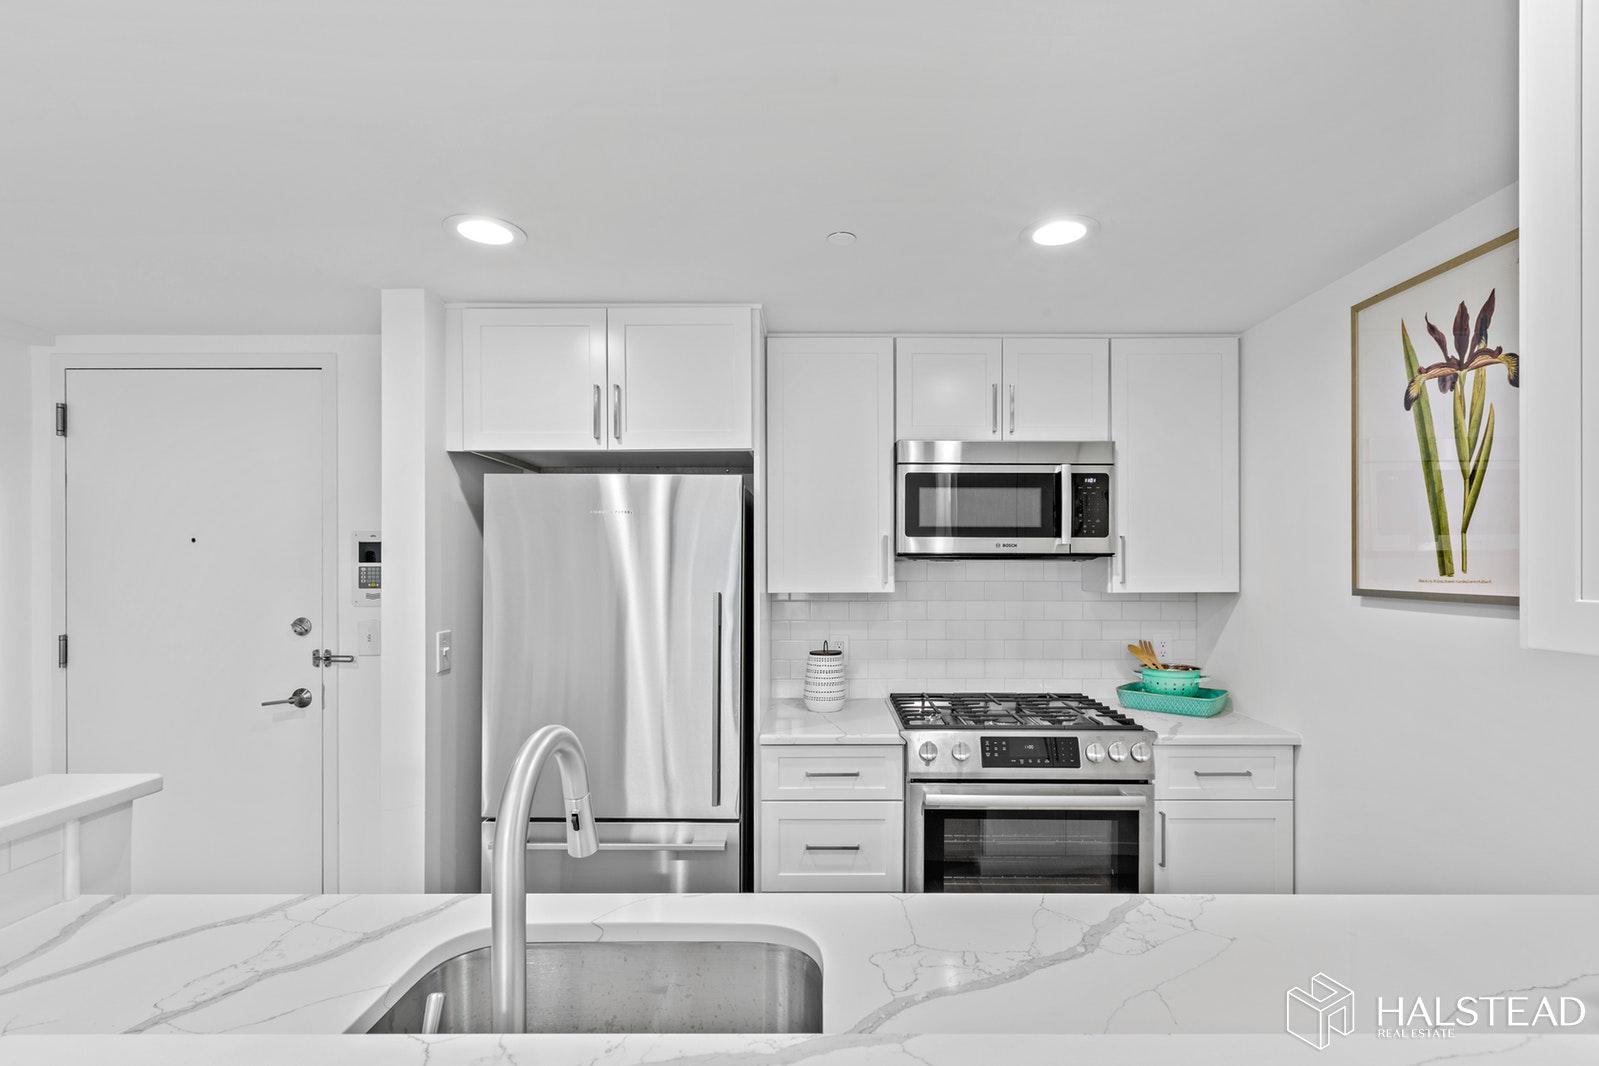 149 ESSEX ST 6N, Jersey City Downtown, $835,000, Web #: 20010086